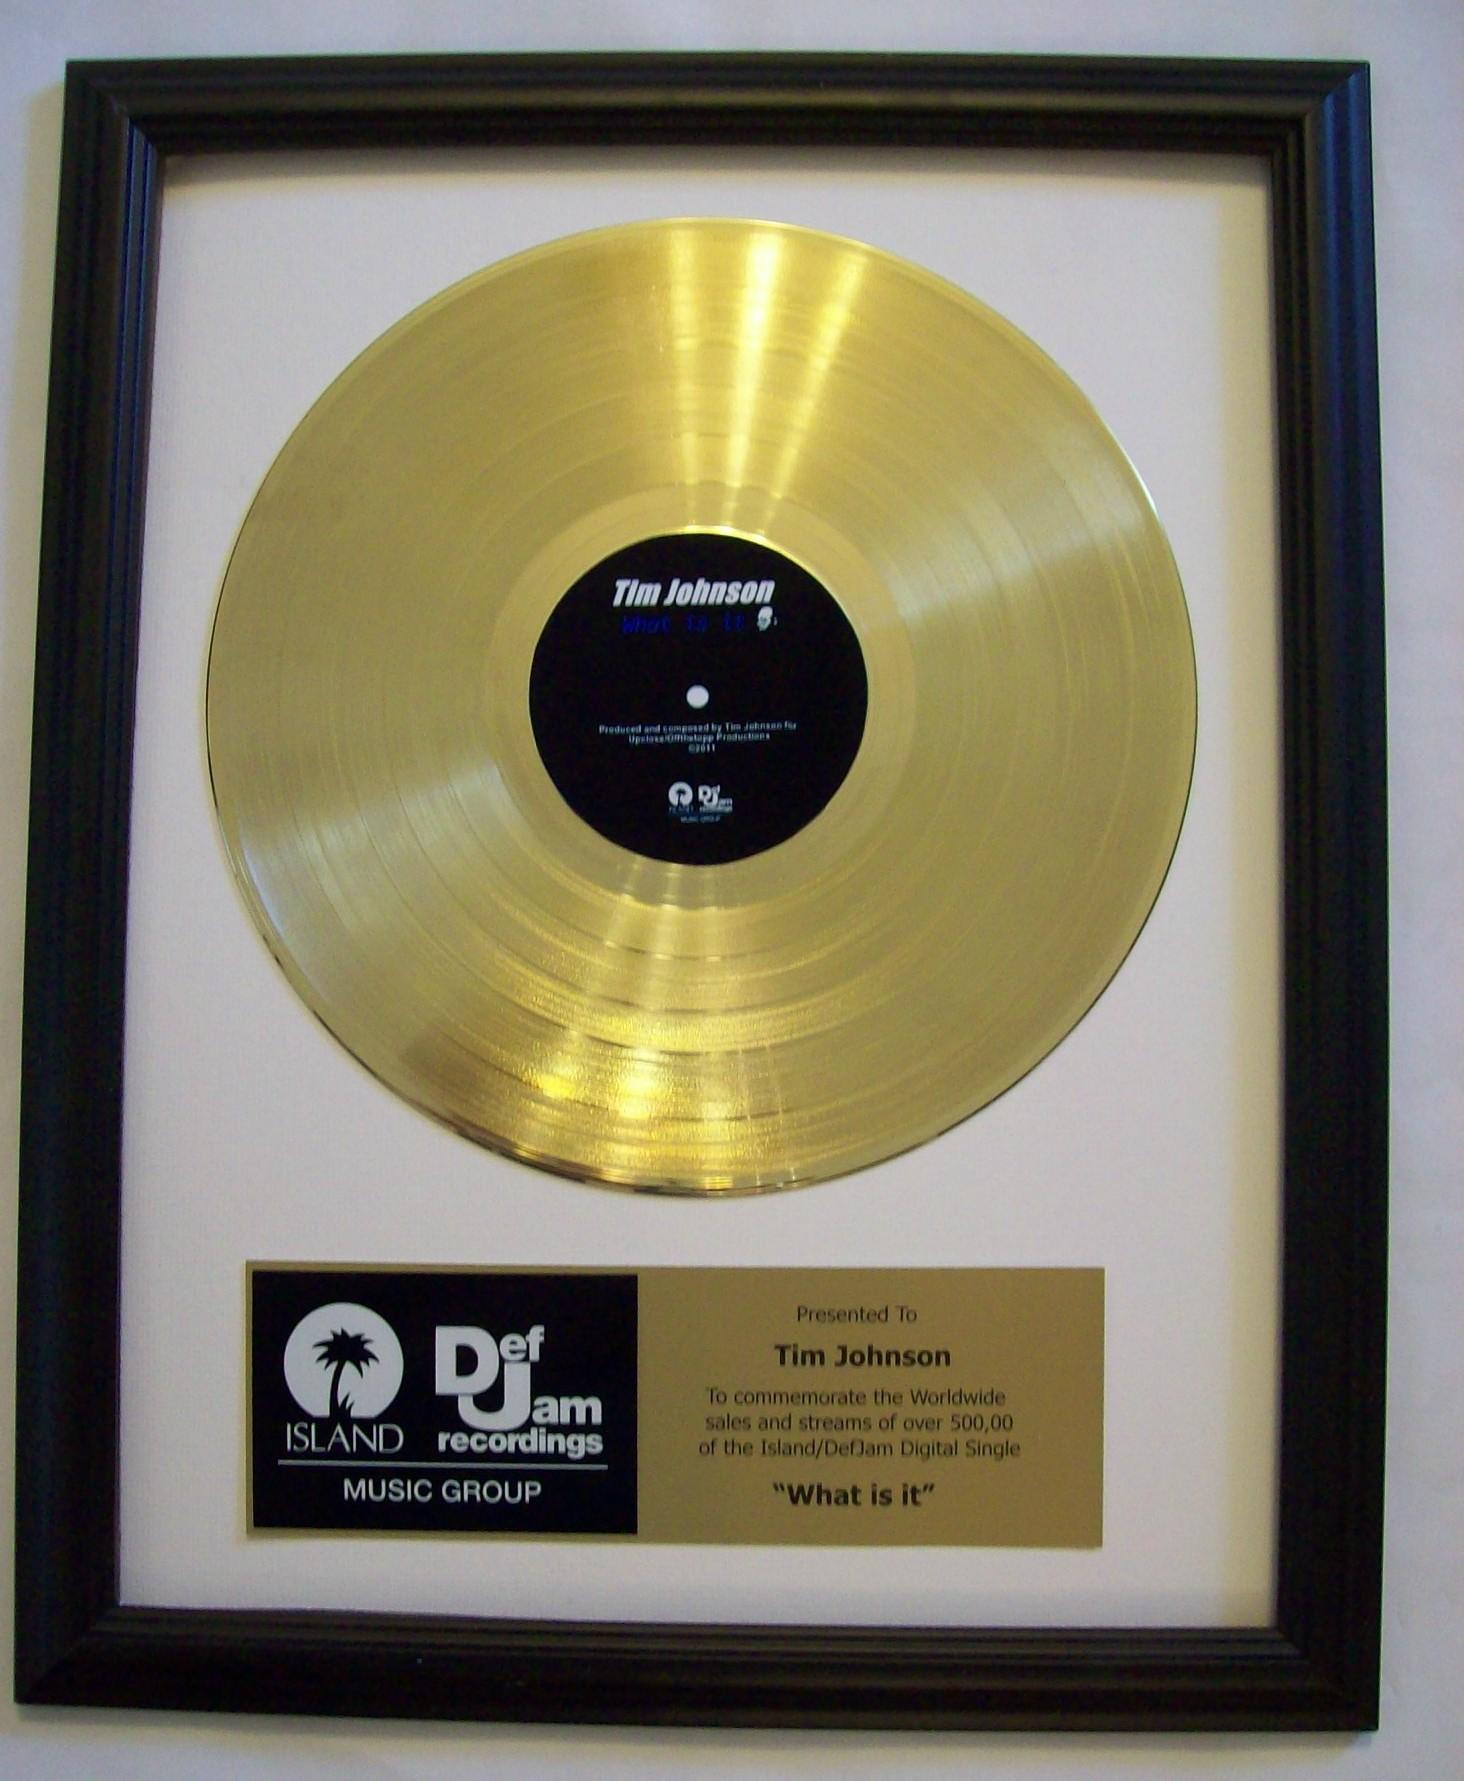 Custom Gold Lp Record Award Trophy